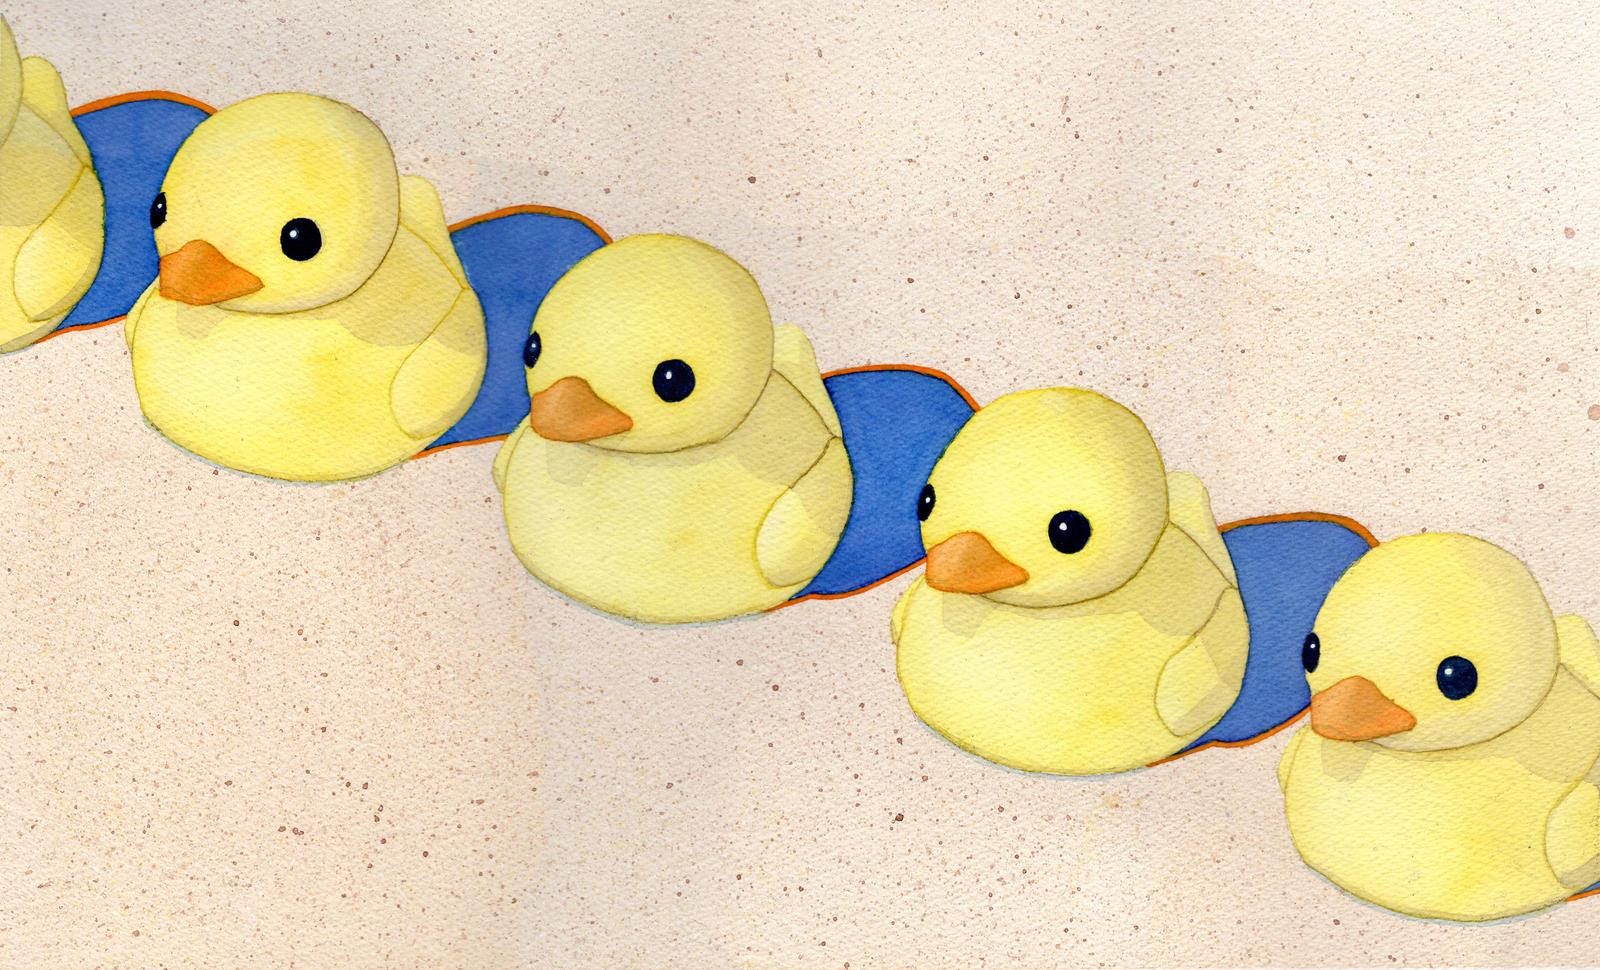 Ducks in a Row by M-Rehe